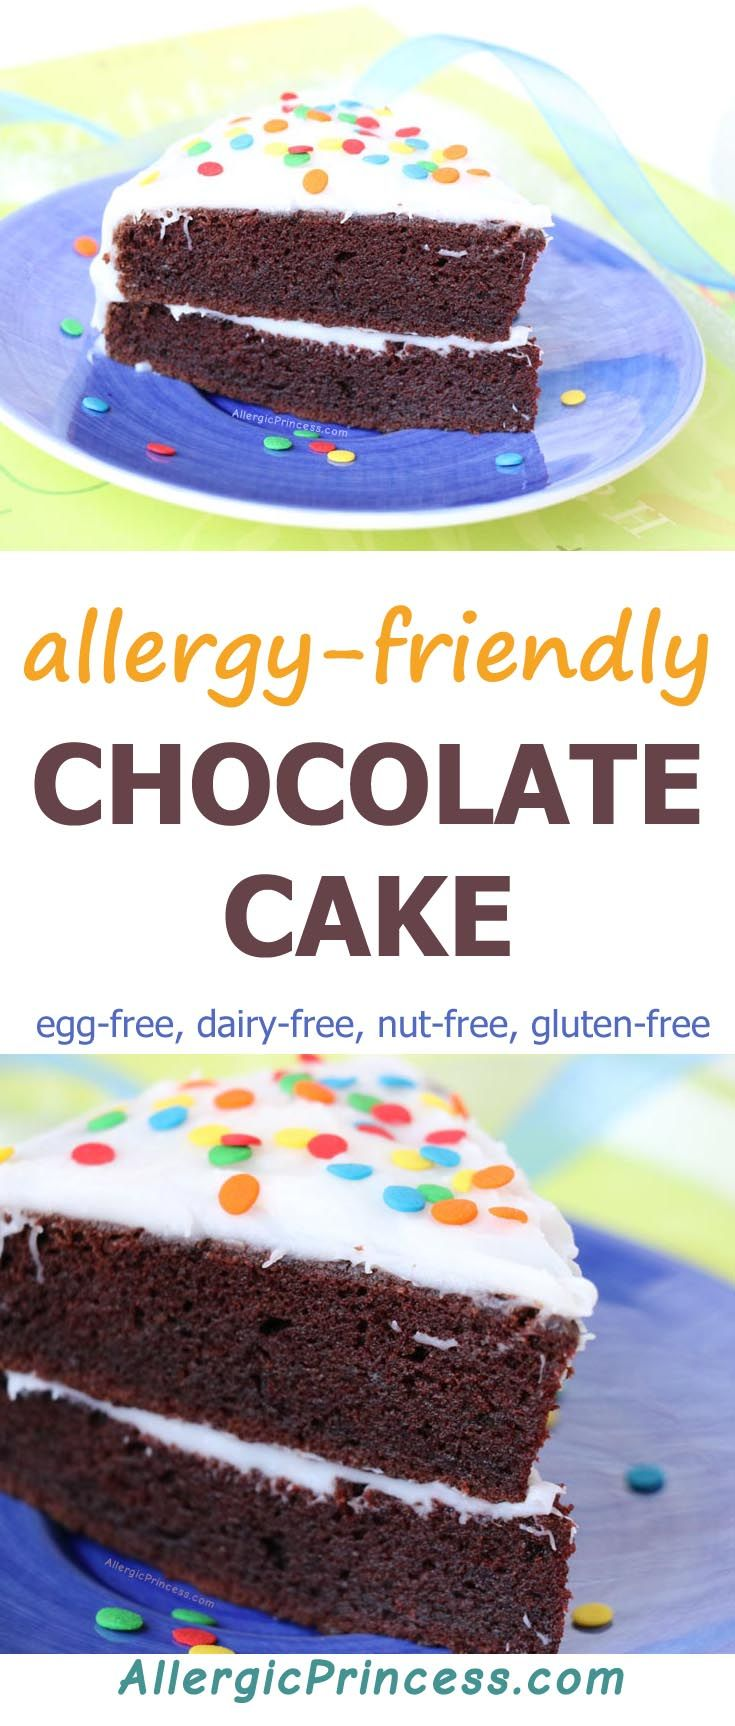 Enjoyable Egg Free Dairy Free Nut Free Gluten Free Chocolate Cake Recipe Funny Birthday Cards Online Inifodamsfinfo